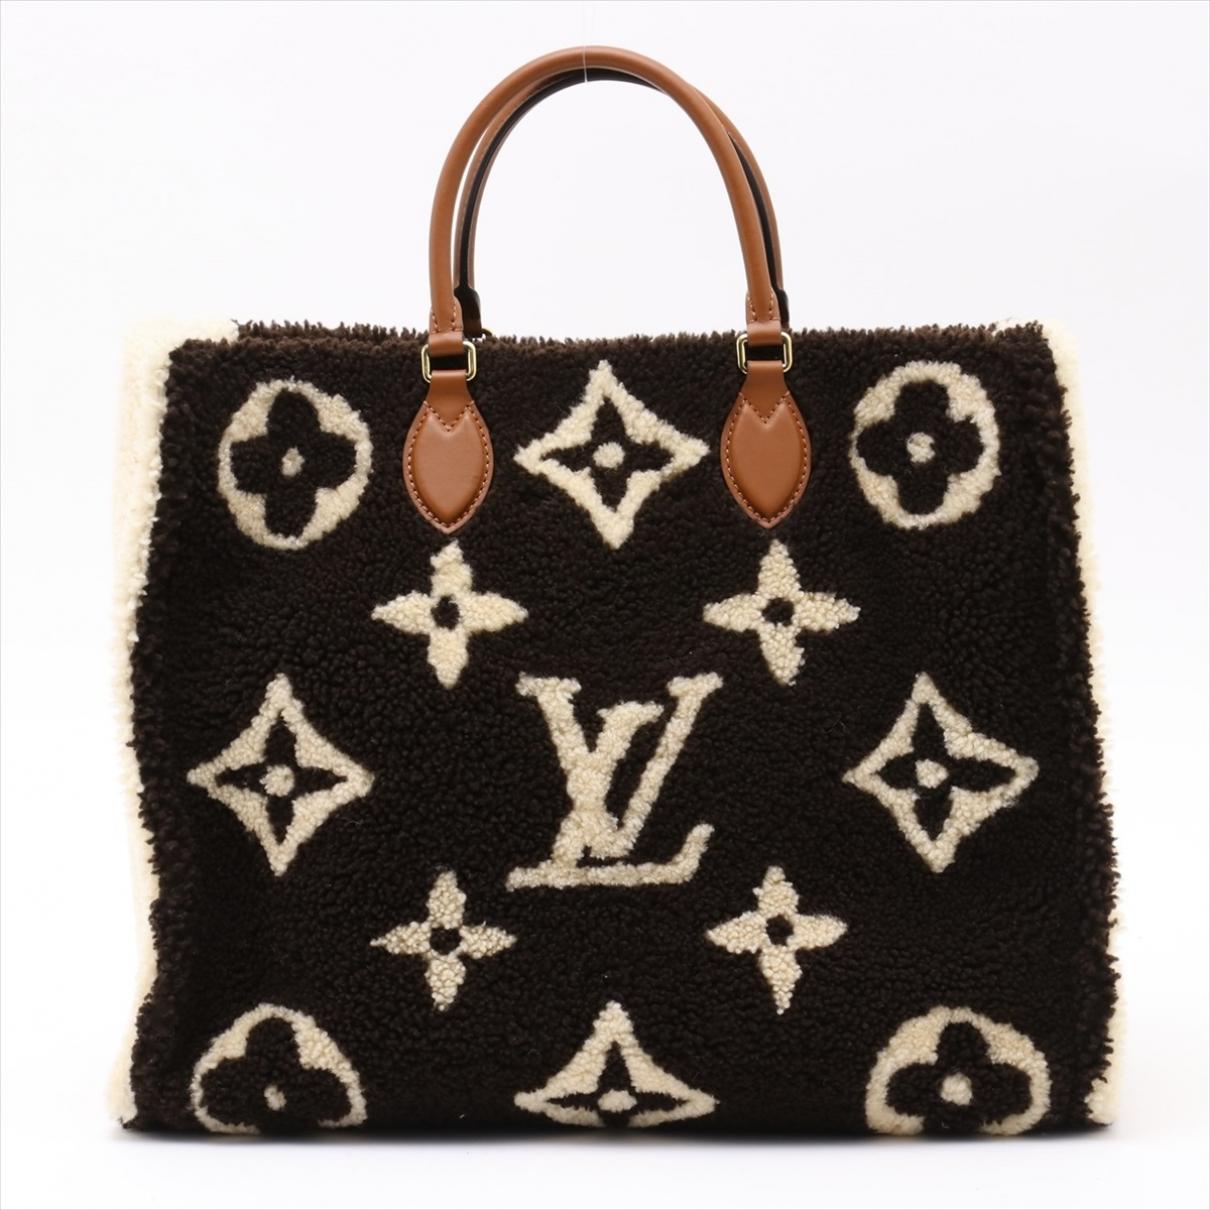 Louis Vuitton Onthego Black Shearling handbag for Women \N